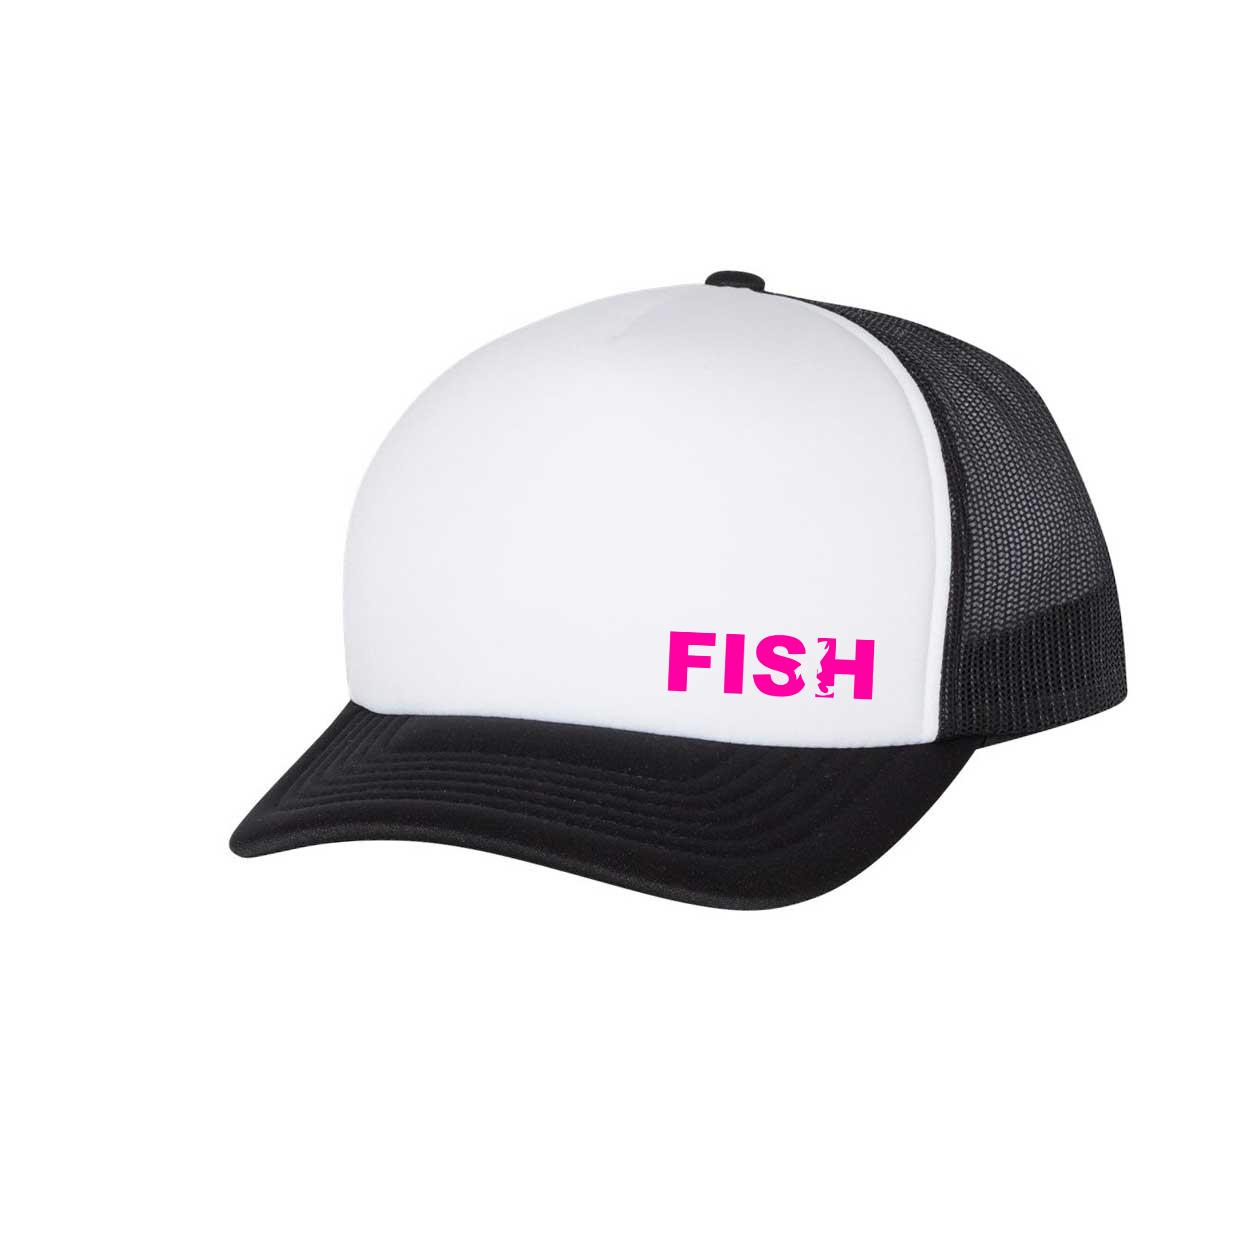 Fish Catch Logo Night Out Premium Foam Trucker Snapback Hat Black/White (Pink Logo)